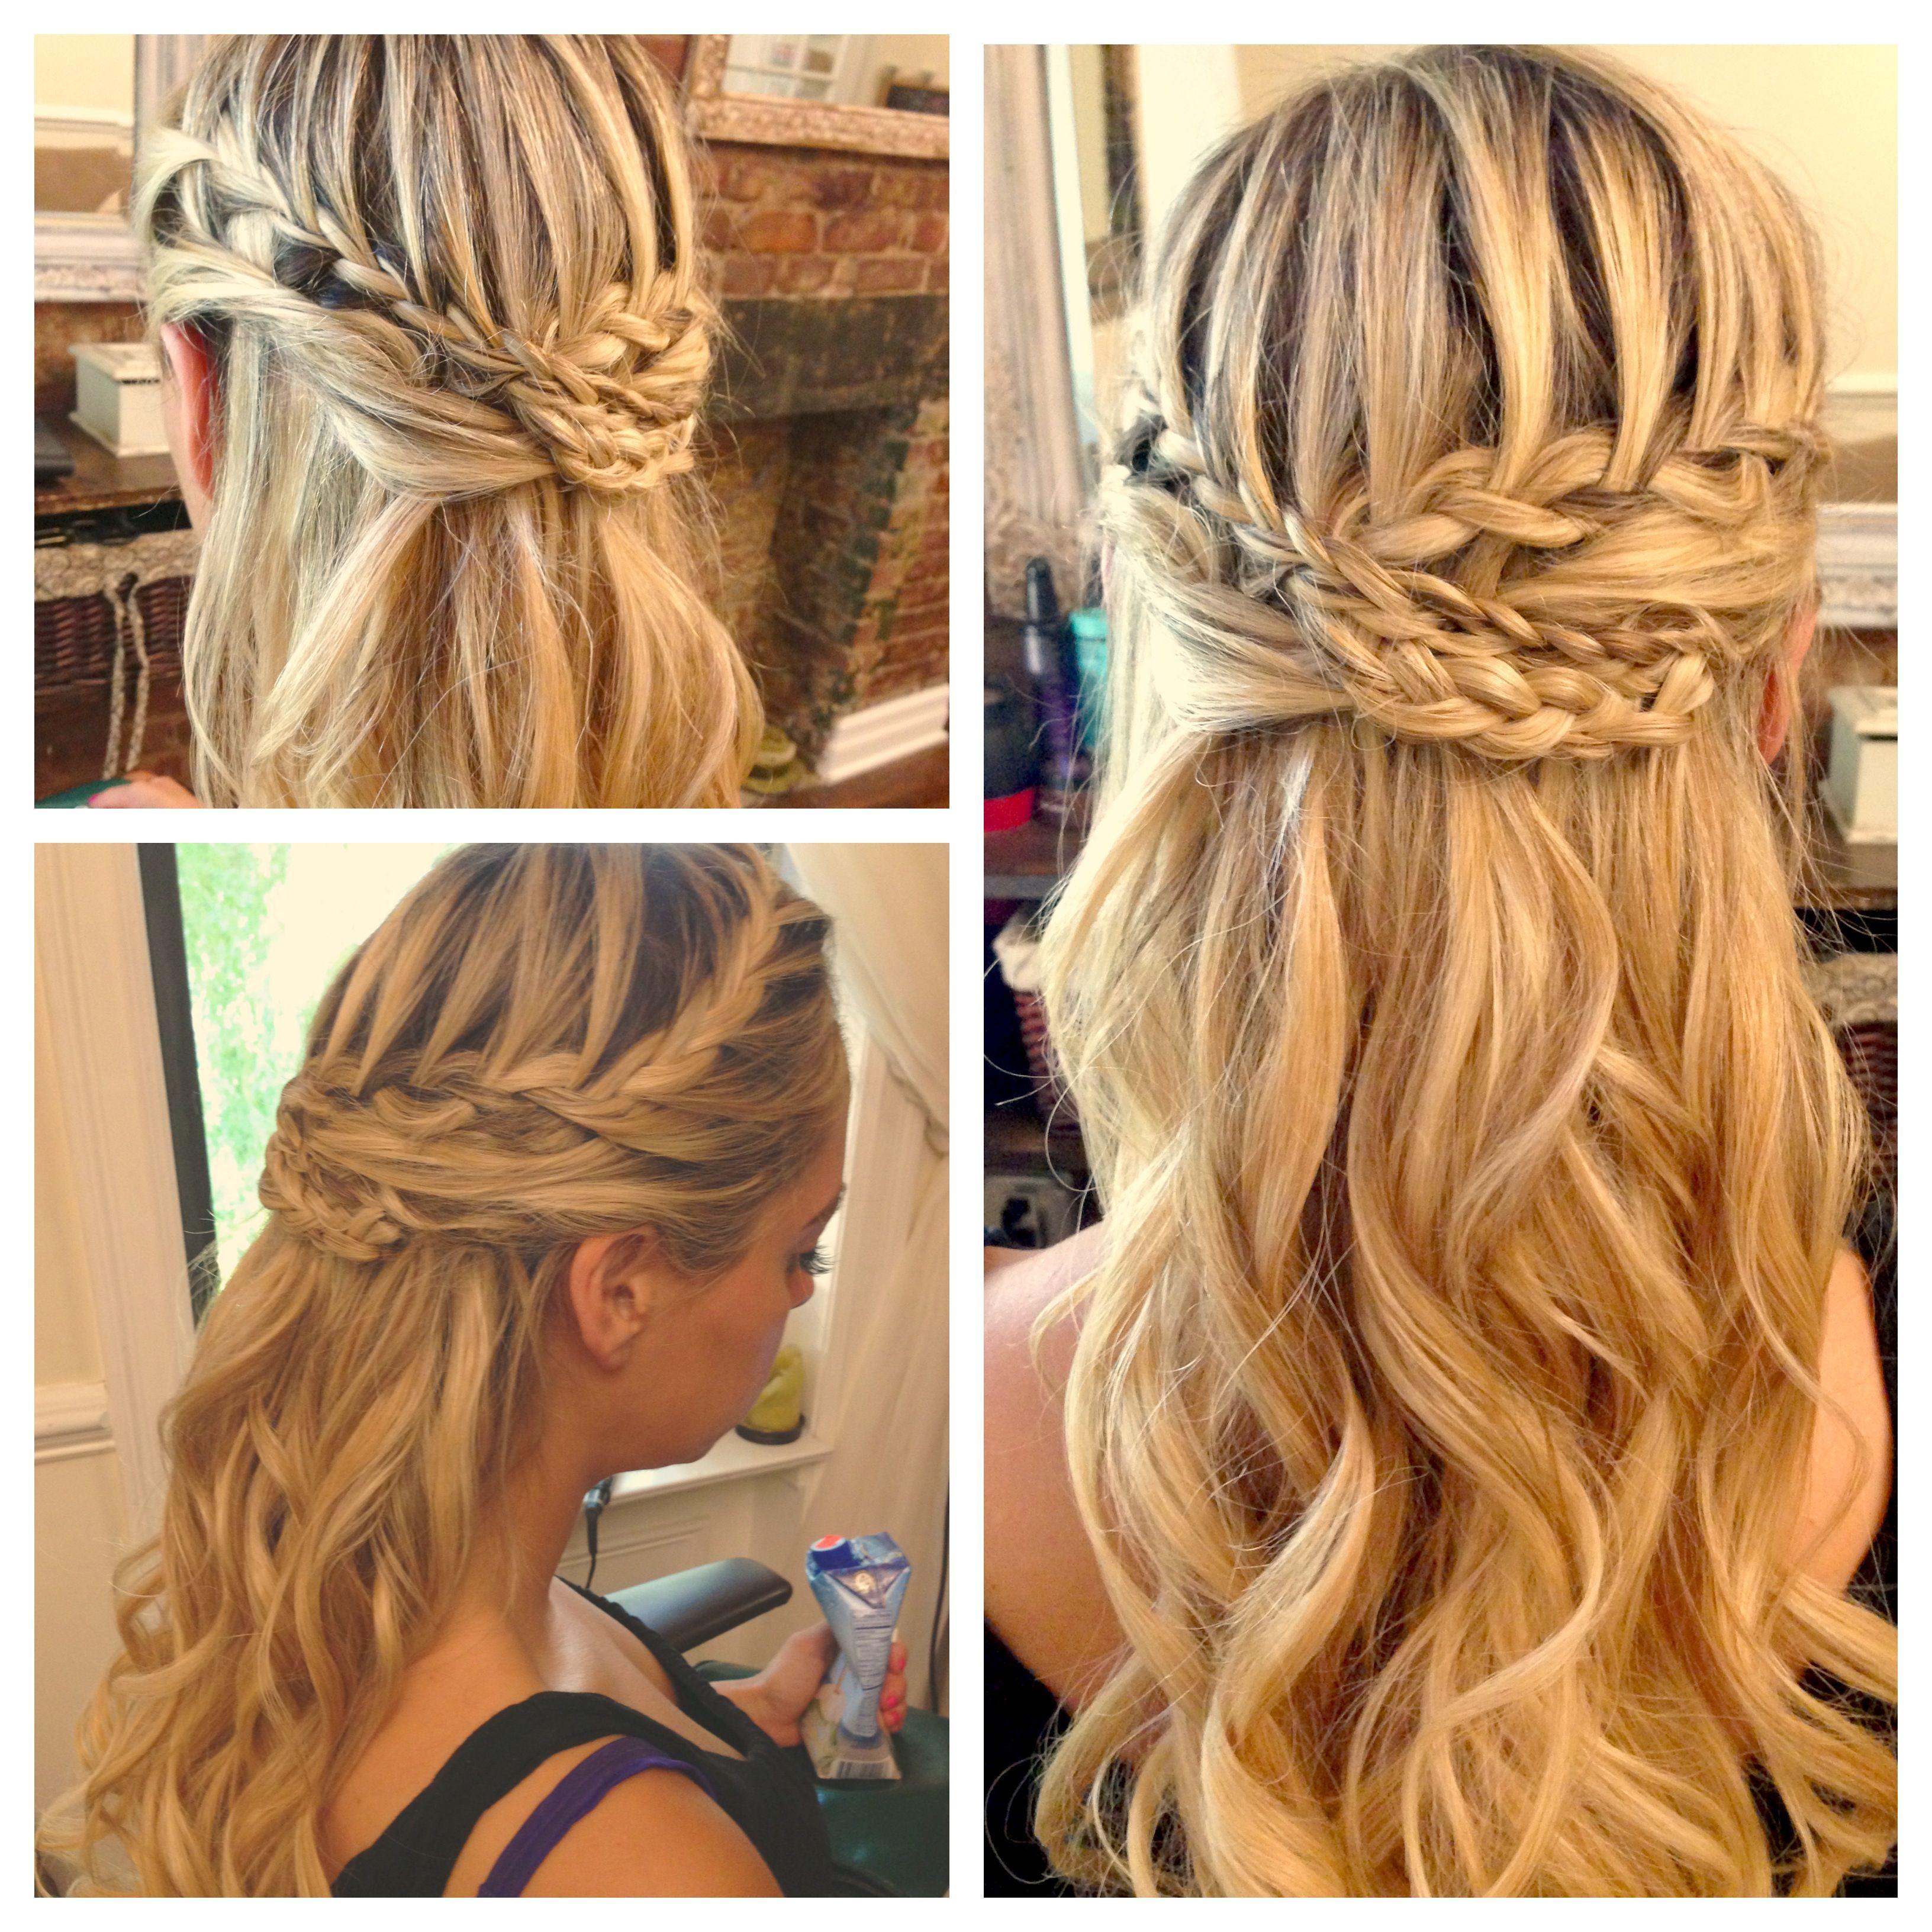 Blonde Braided Half Up Hair by Laureen Krawse Styles on B